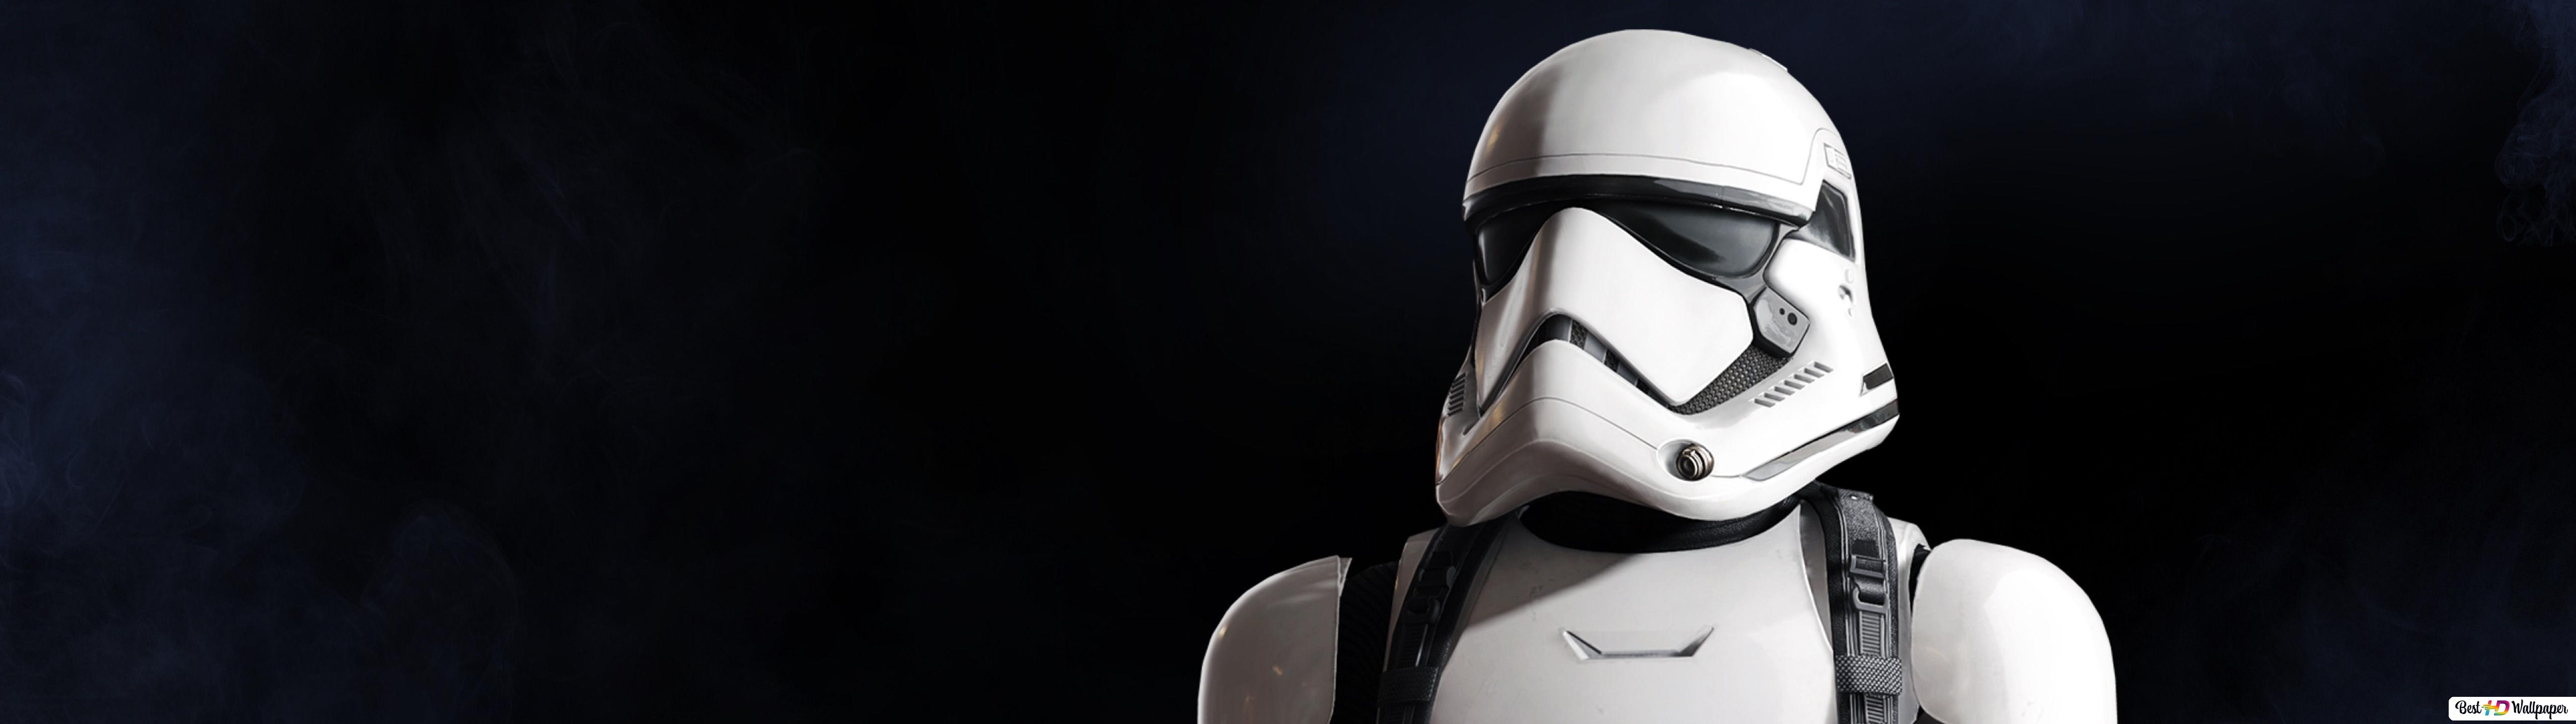 Star Wars Battlefront 2 Permainan Stormtrooper Unduhan Wallpaper Hd